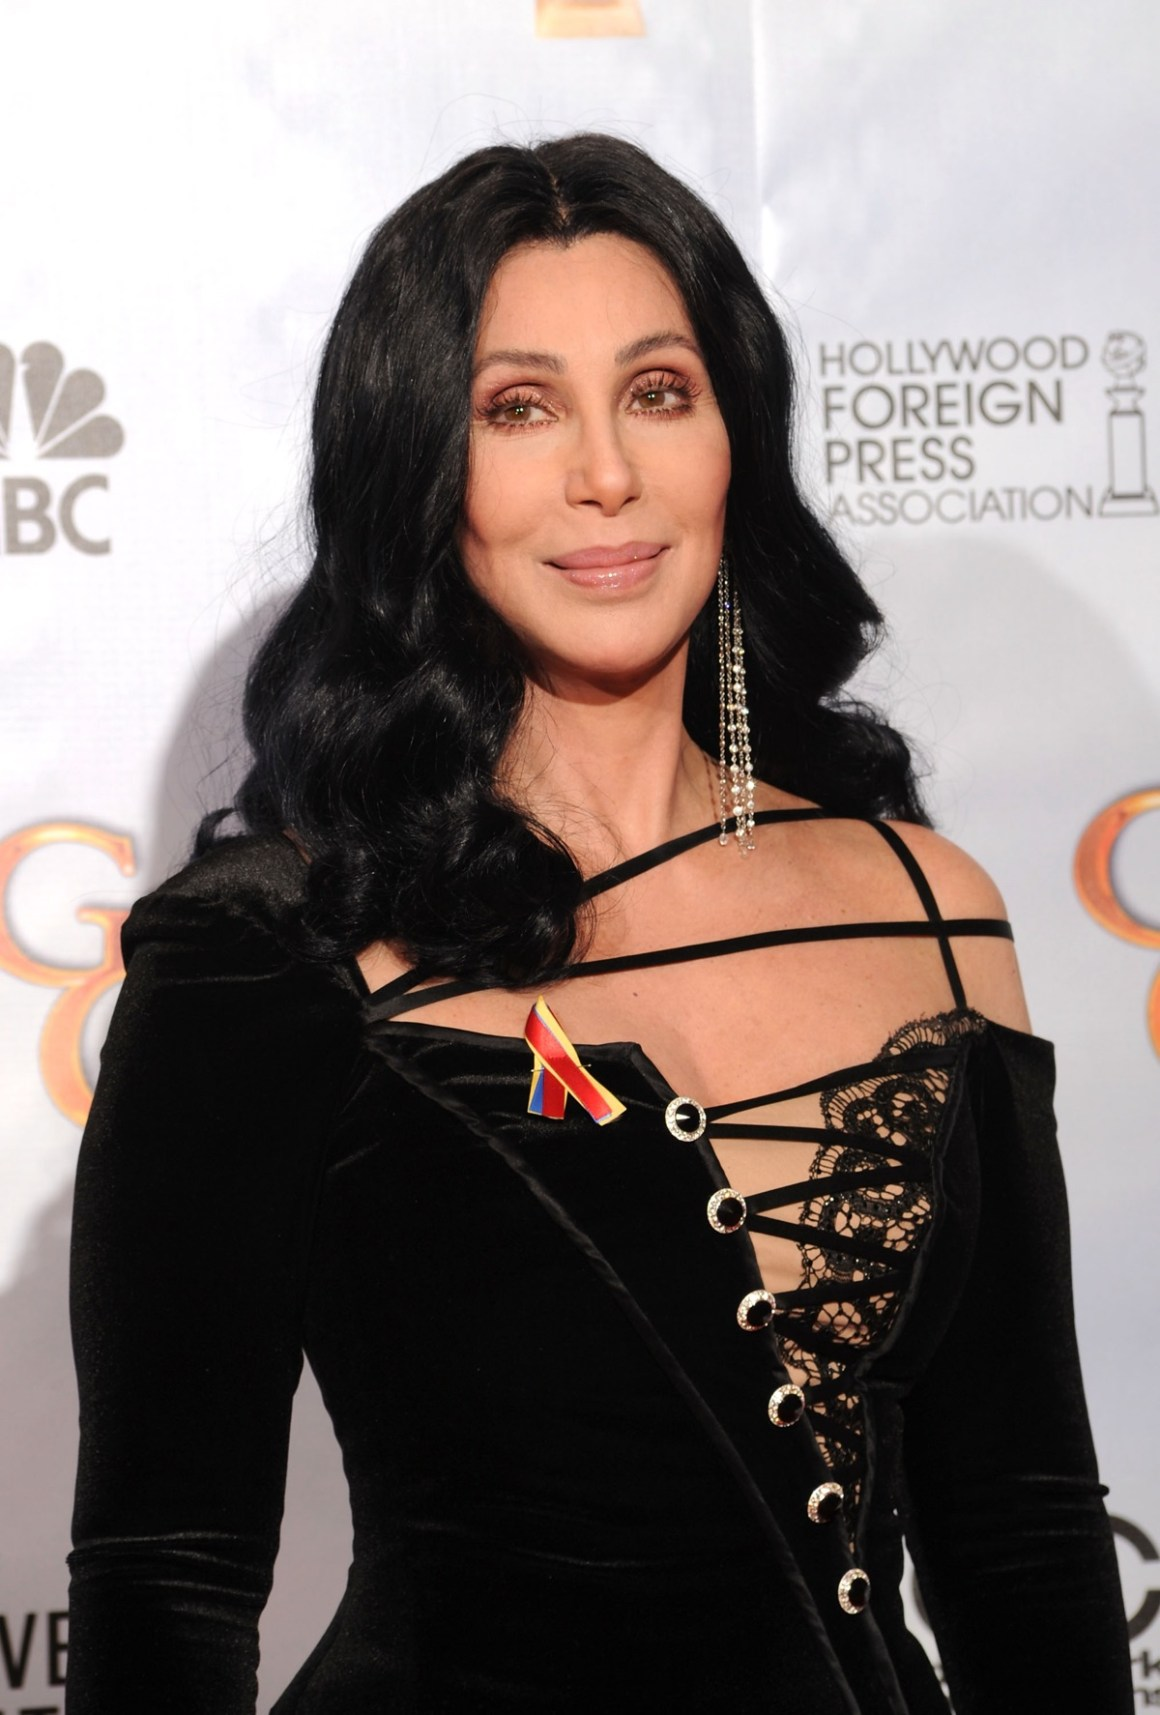 Cher 67th Annual Golden Globe Awards - Press Room